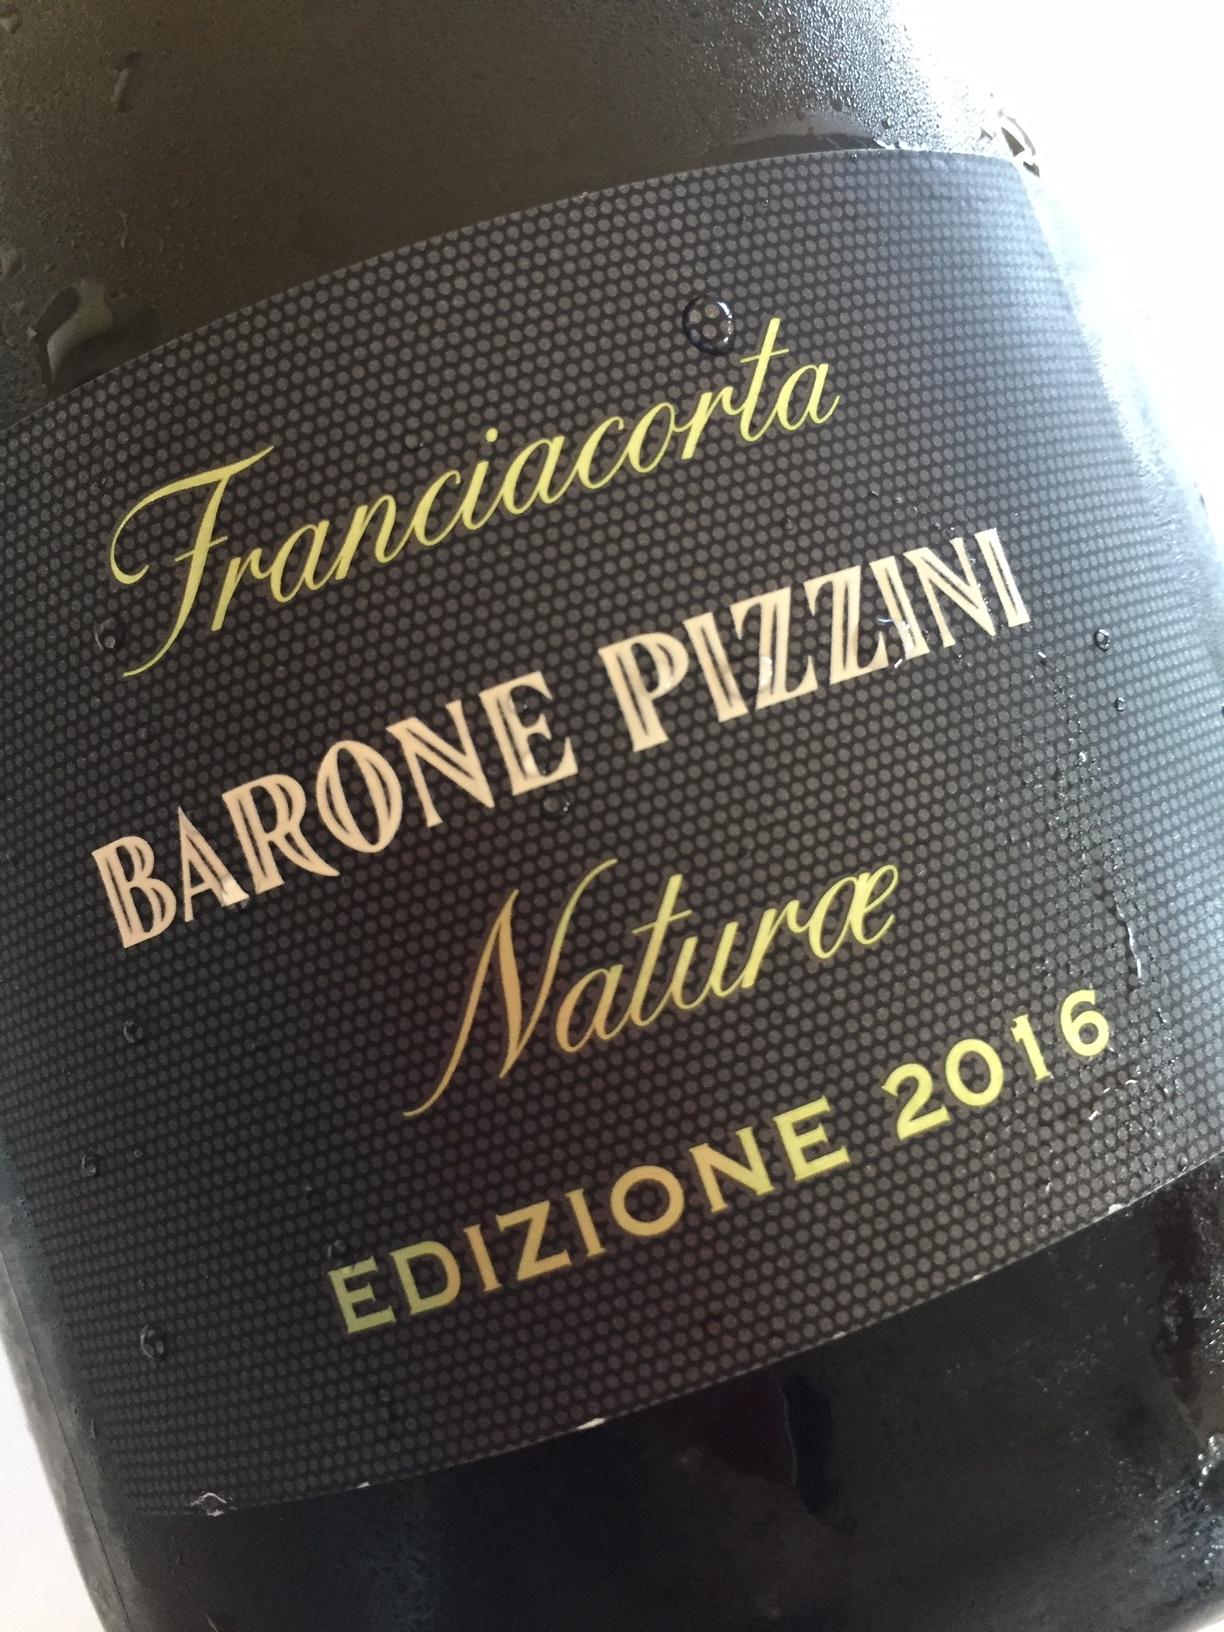 Naturae 2016 Barone Pizzini